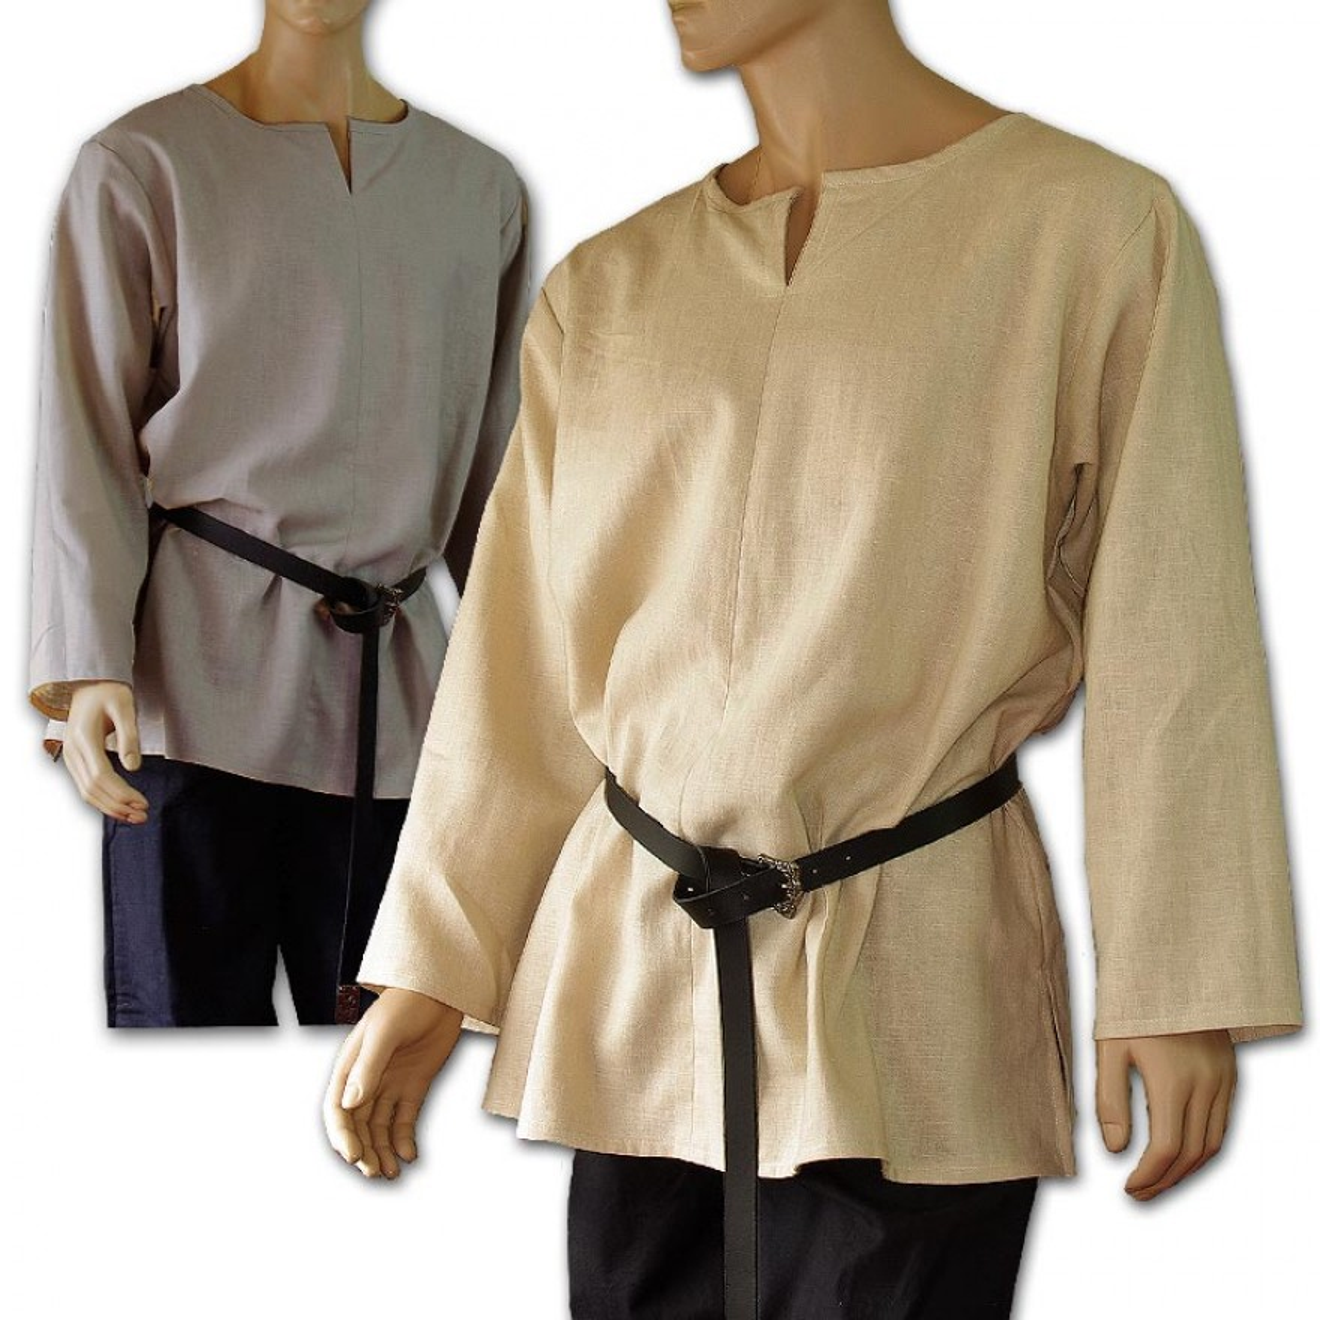 Mittelalter Herrenhemd Maßanfertigung aus Leinen